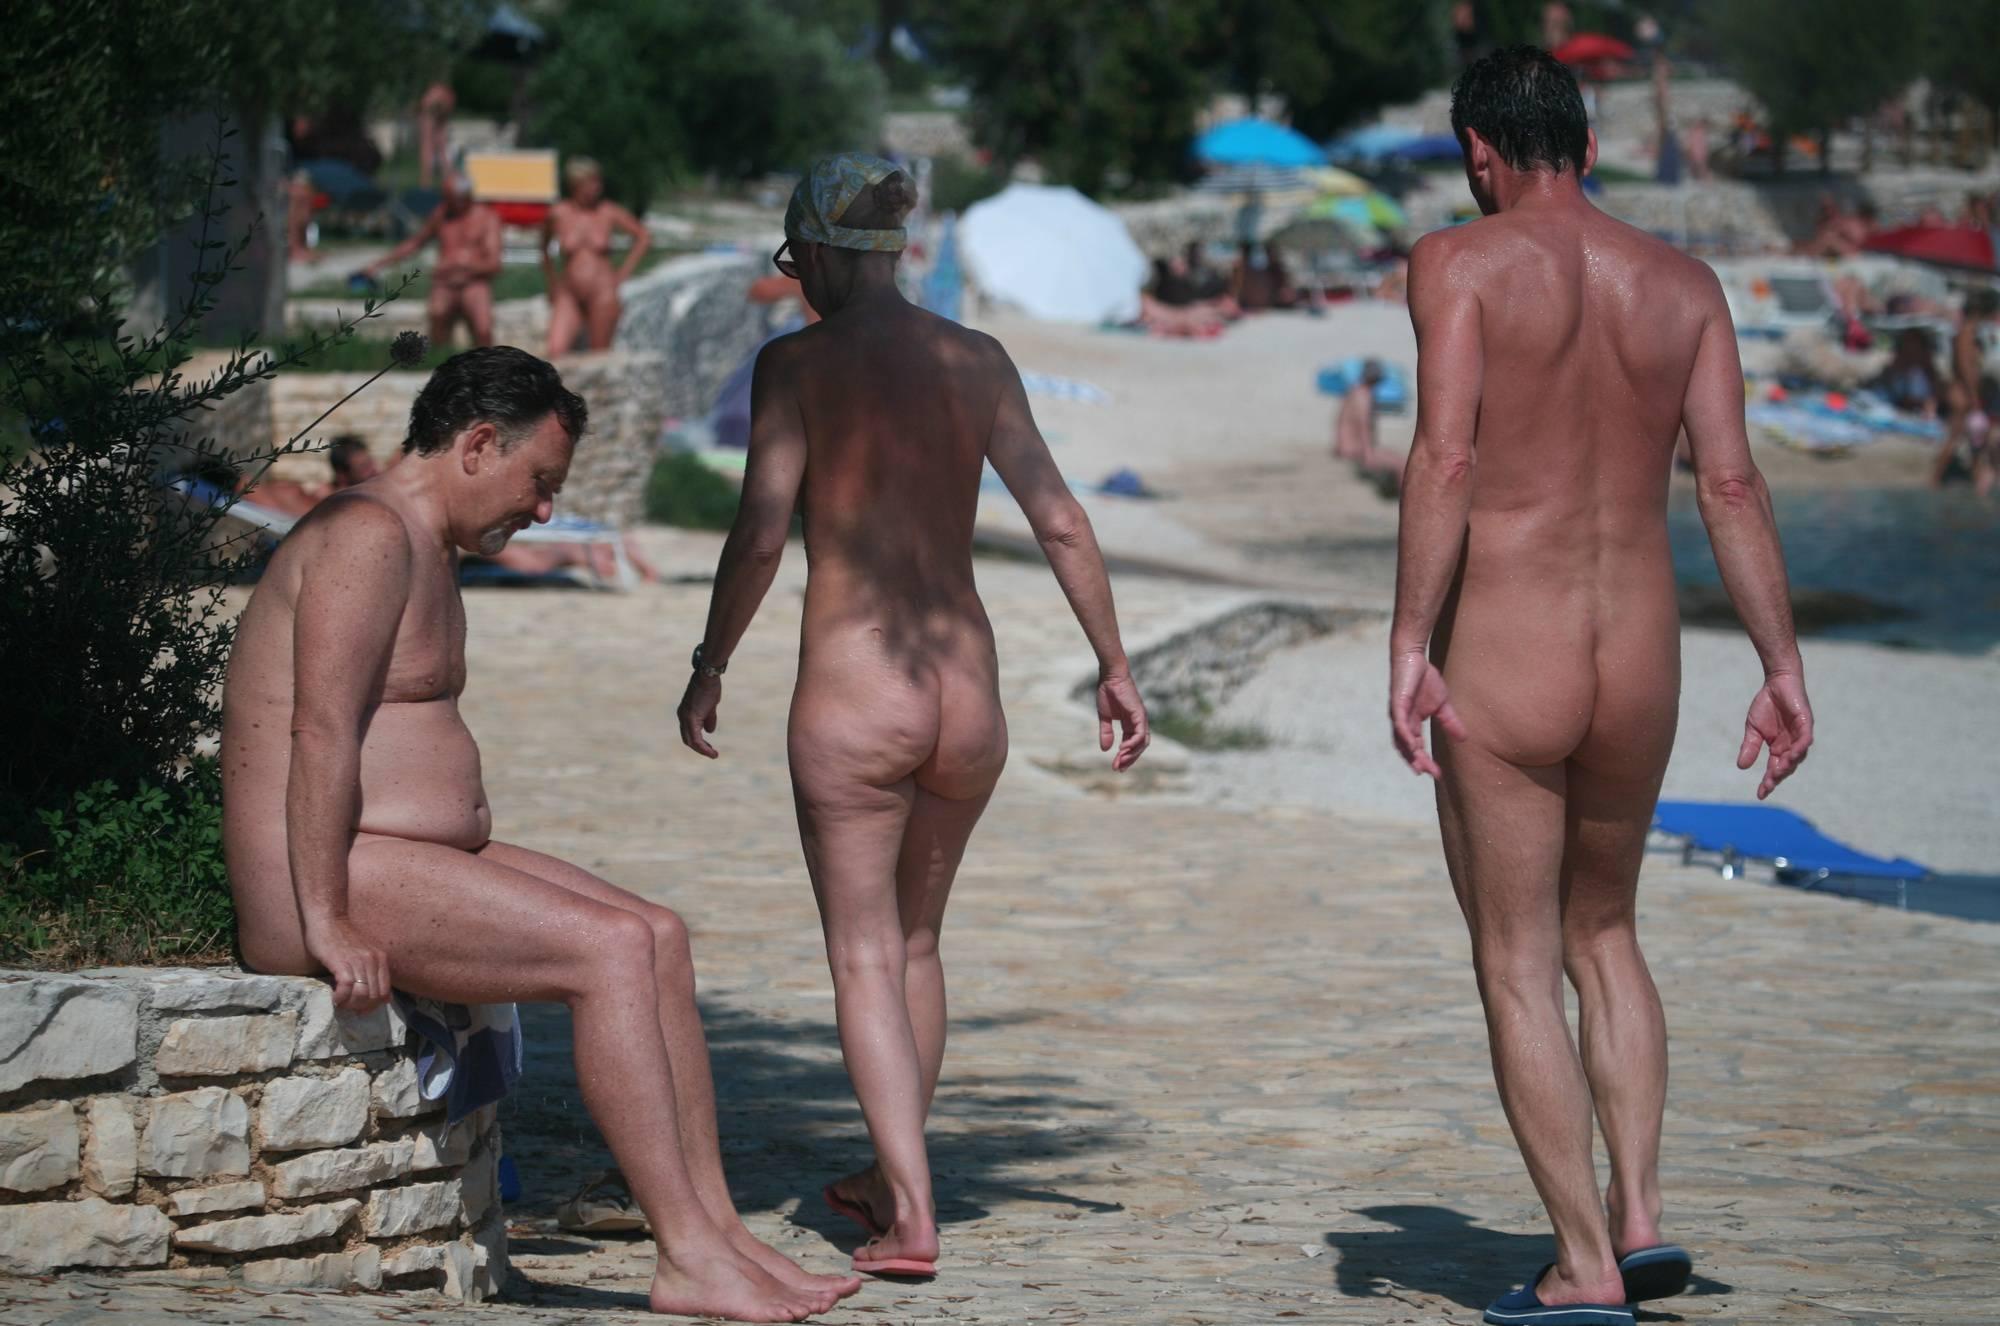 Nudist Beach Pedestrians - 2